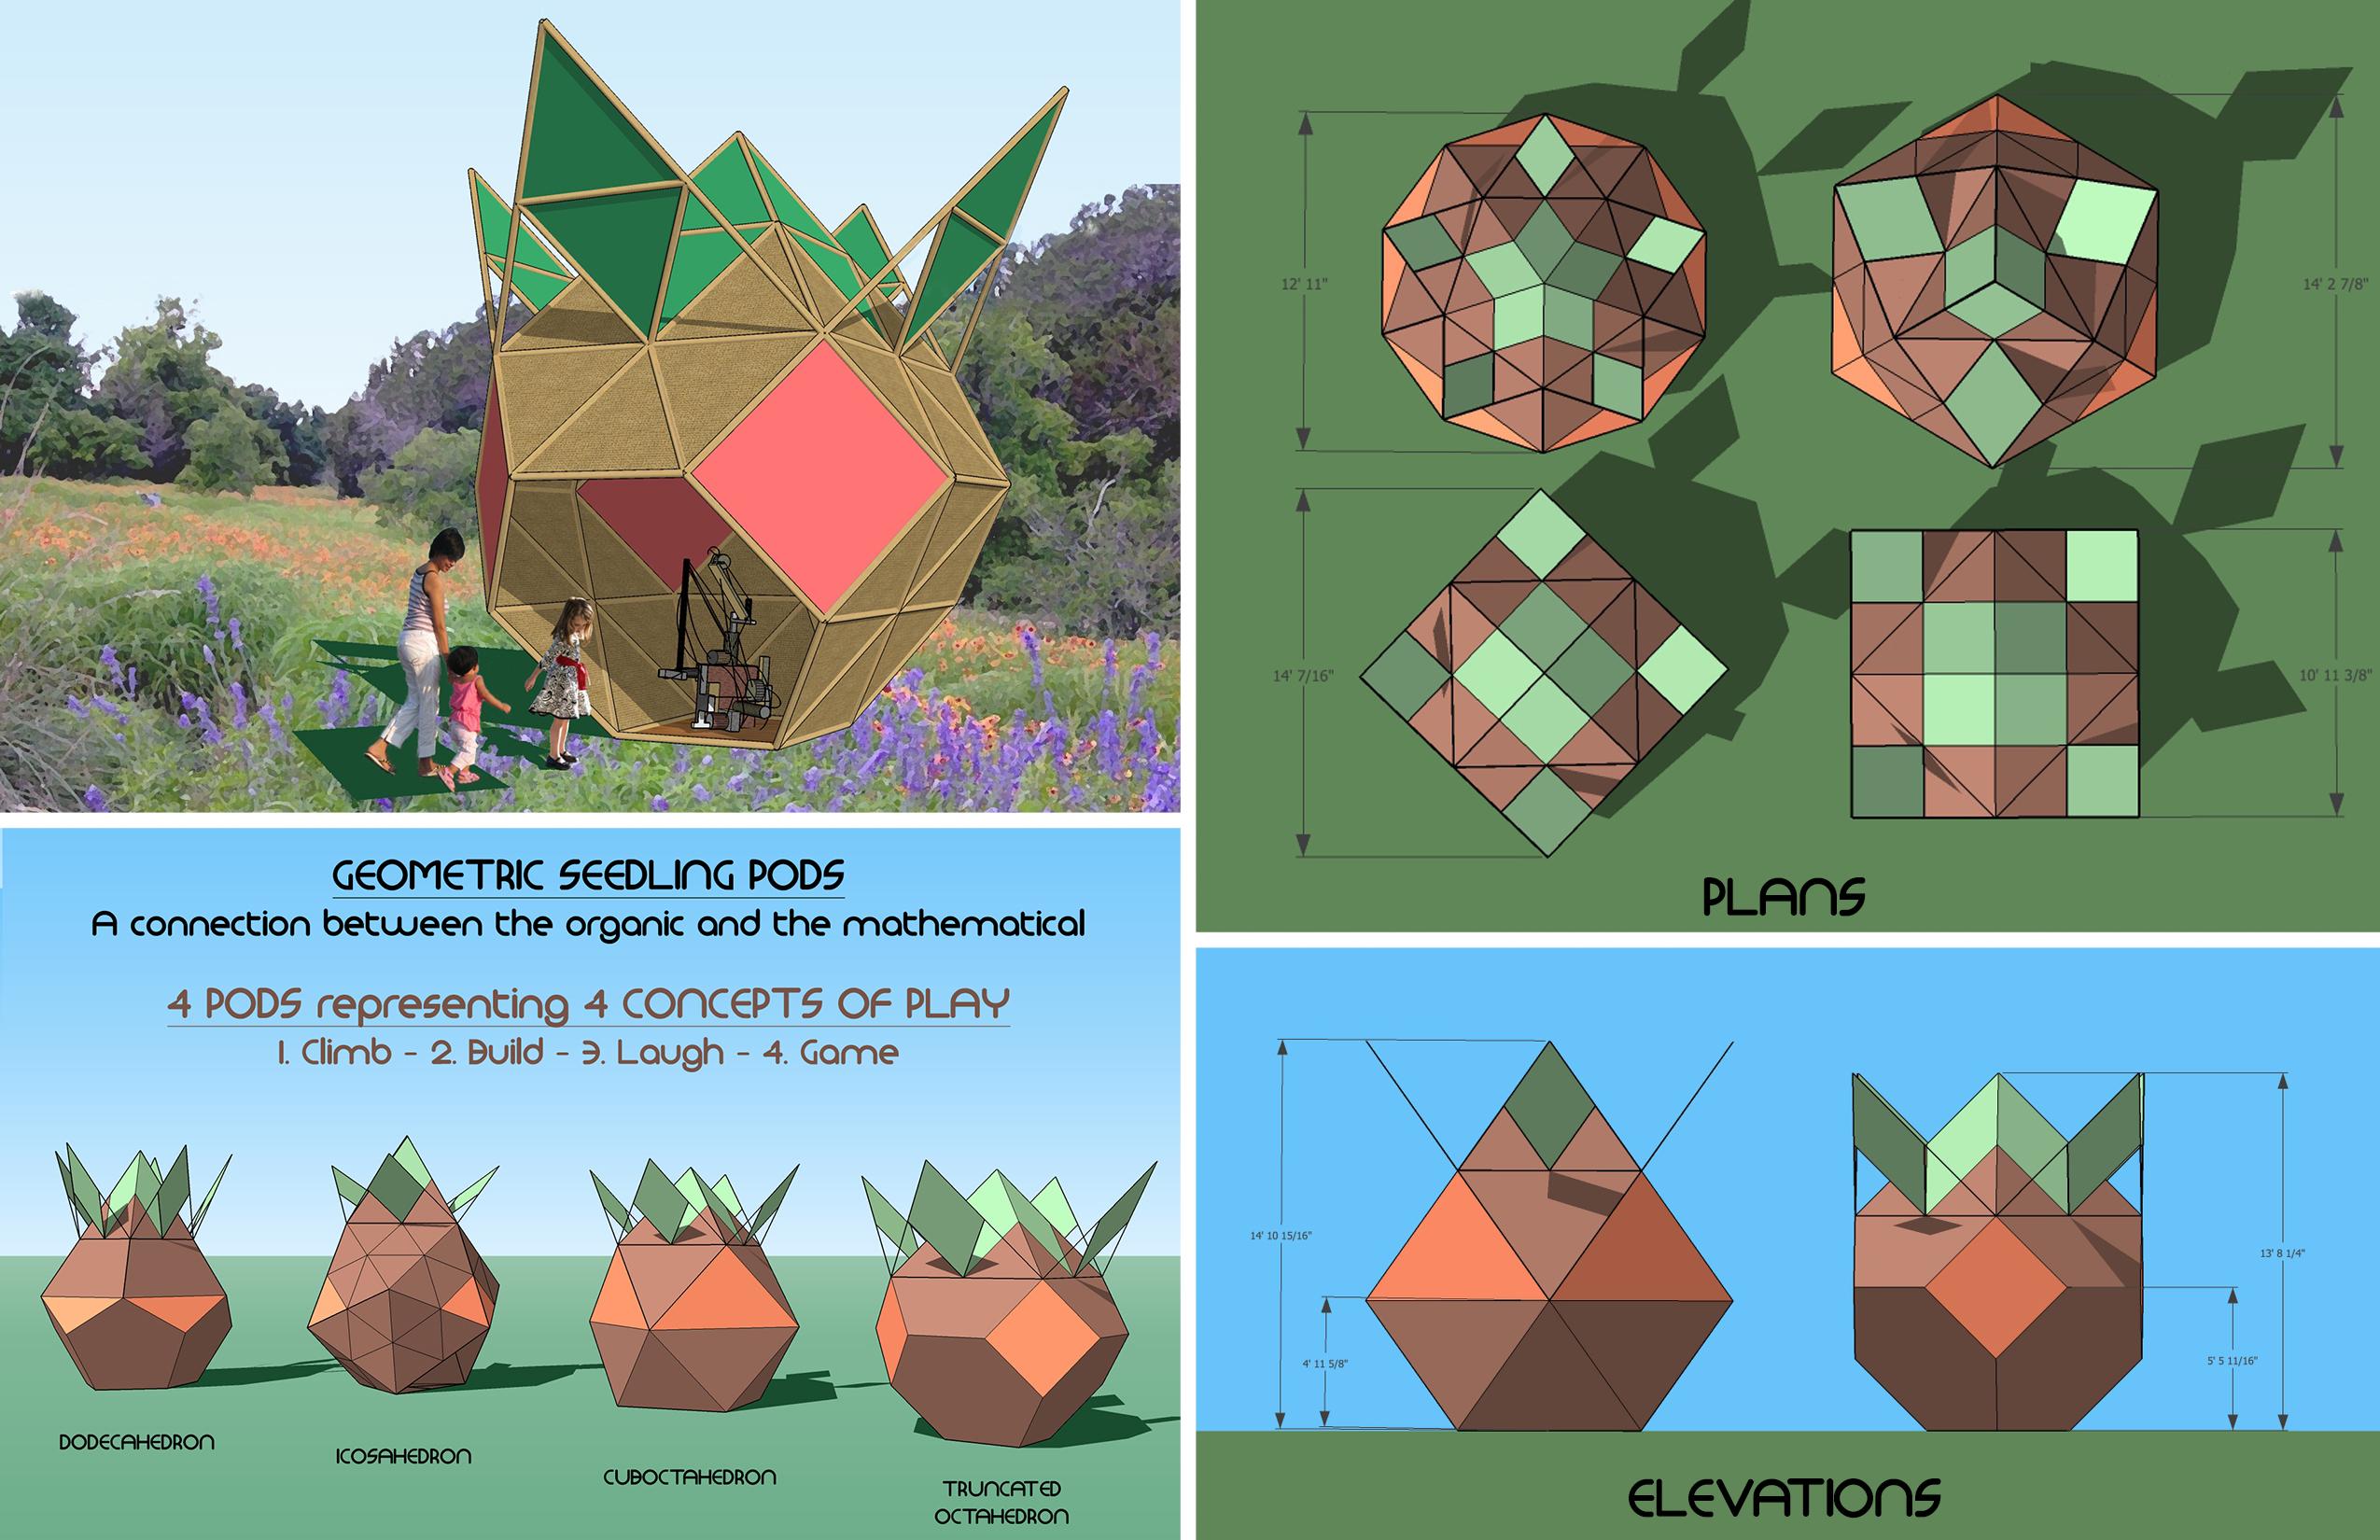 Geometric Seedling Pods3